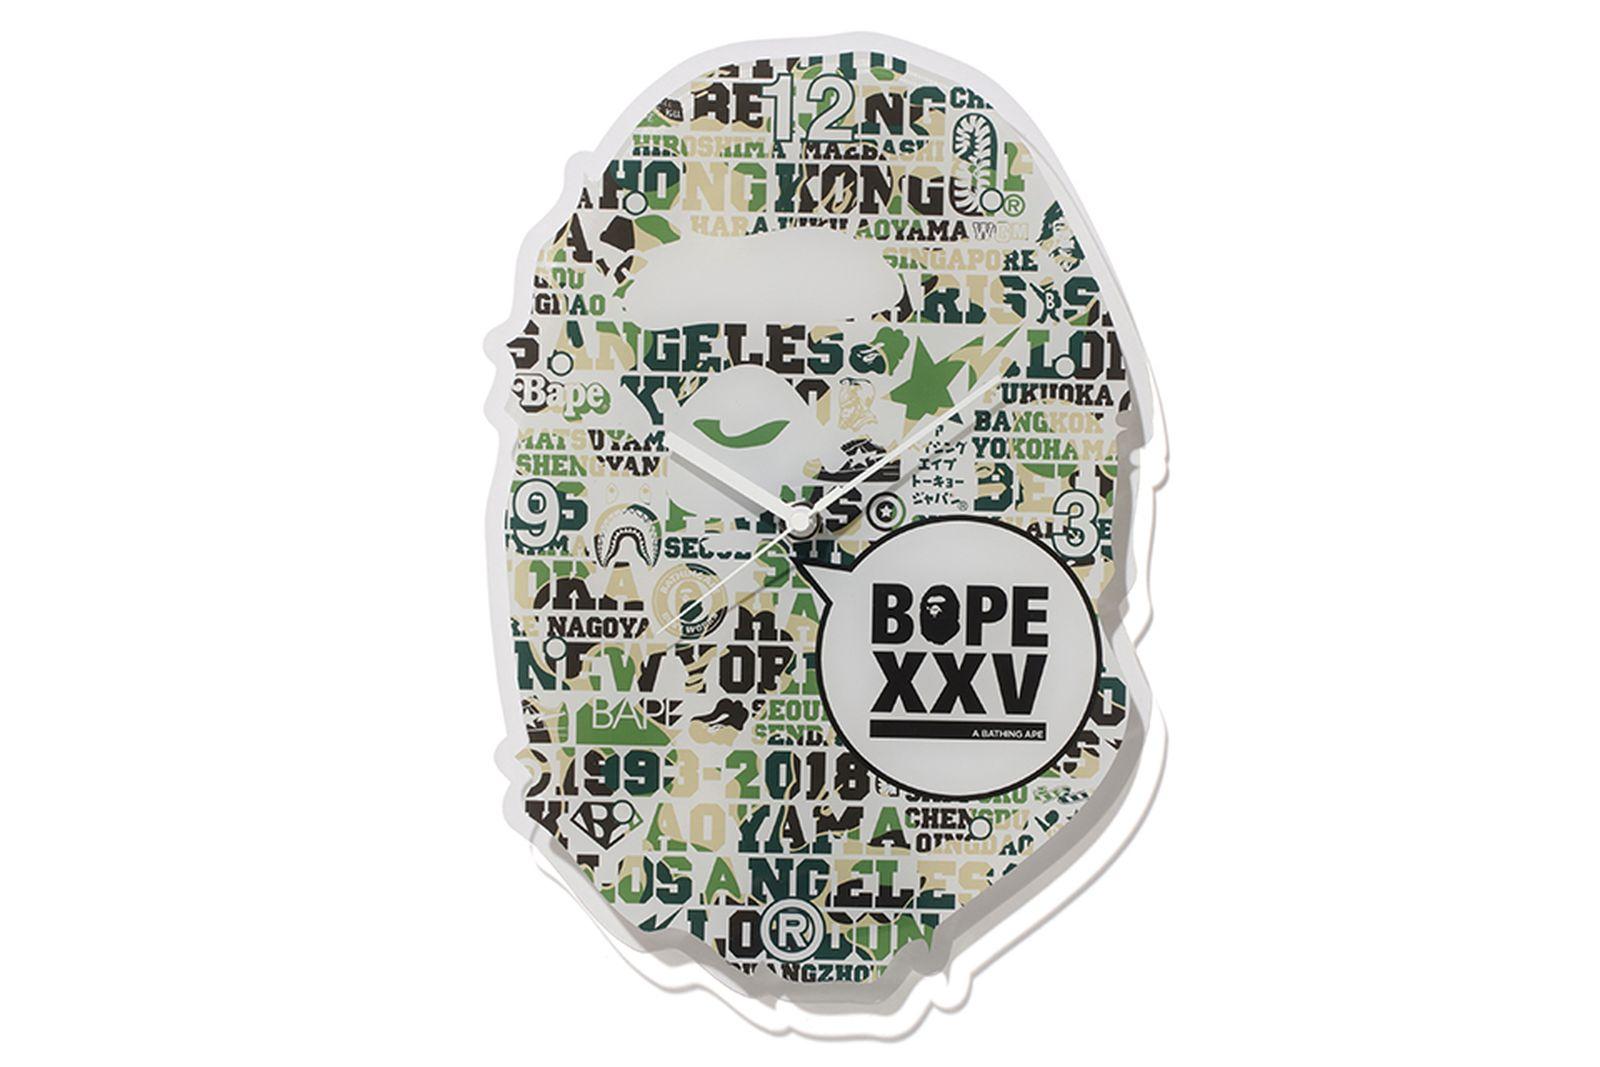 bape-xxv-34